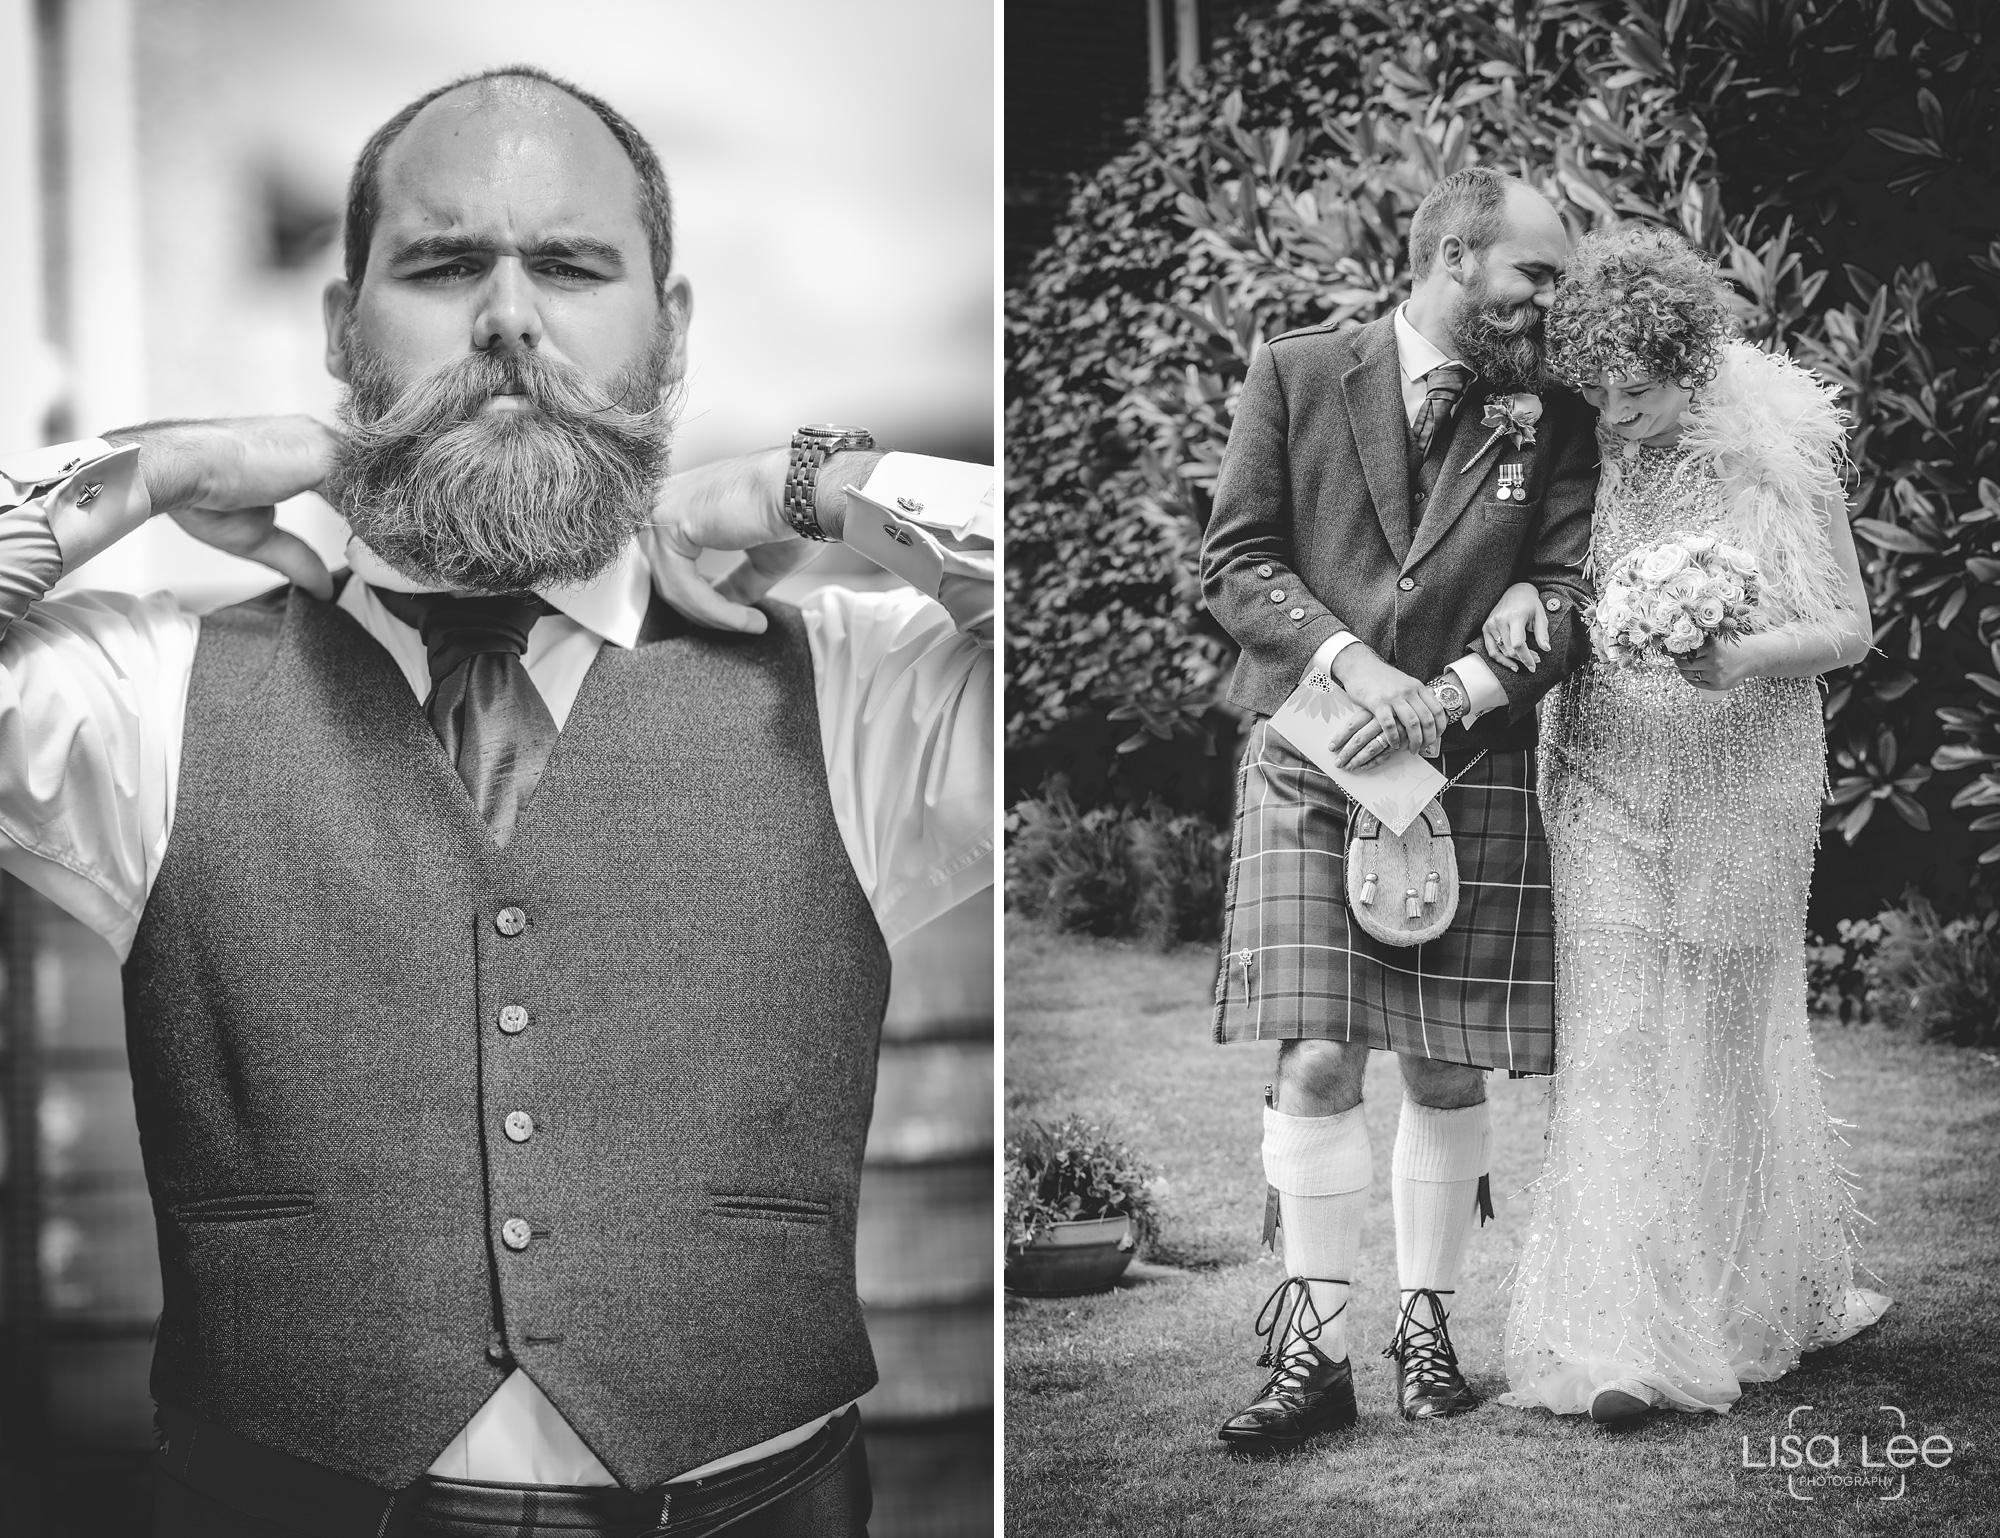 lisa-lee-wedding-photography-bride-groom-1.jpg